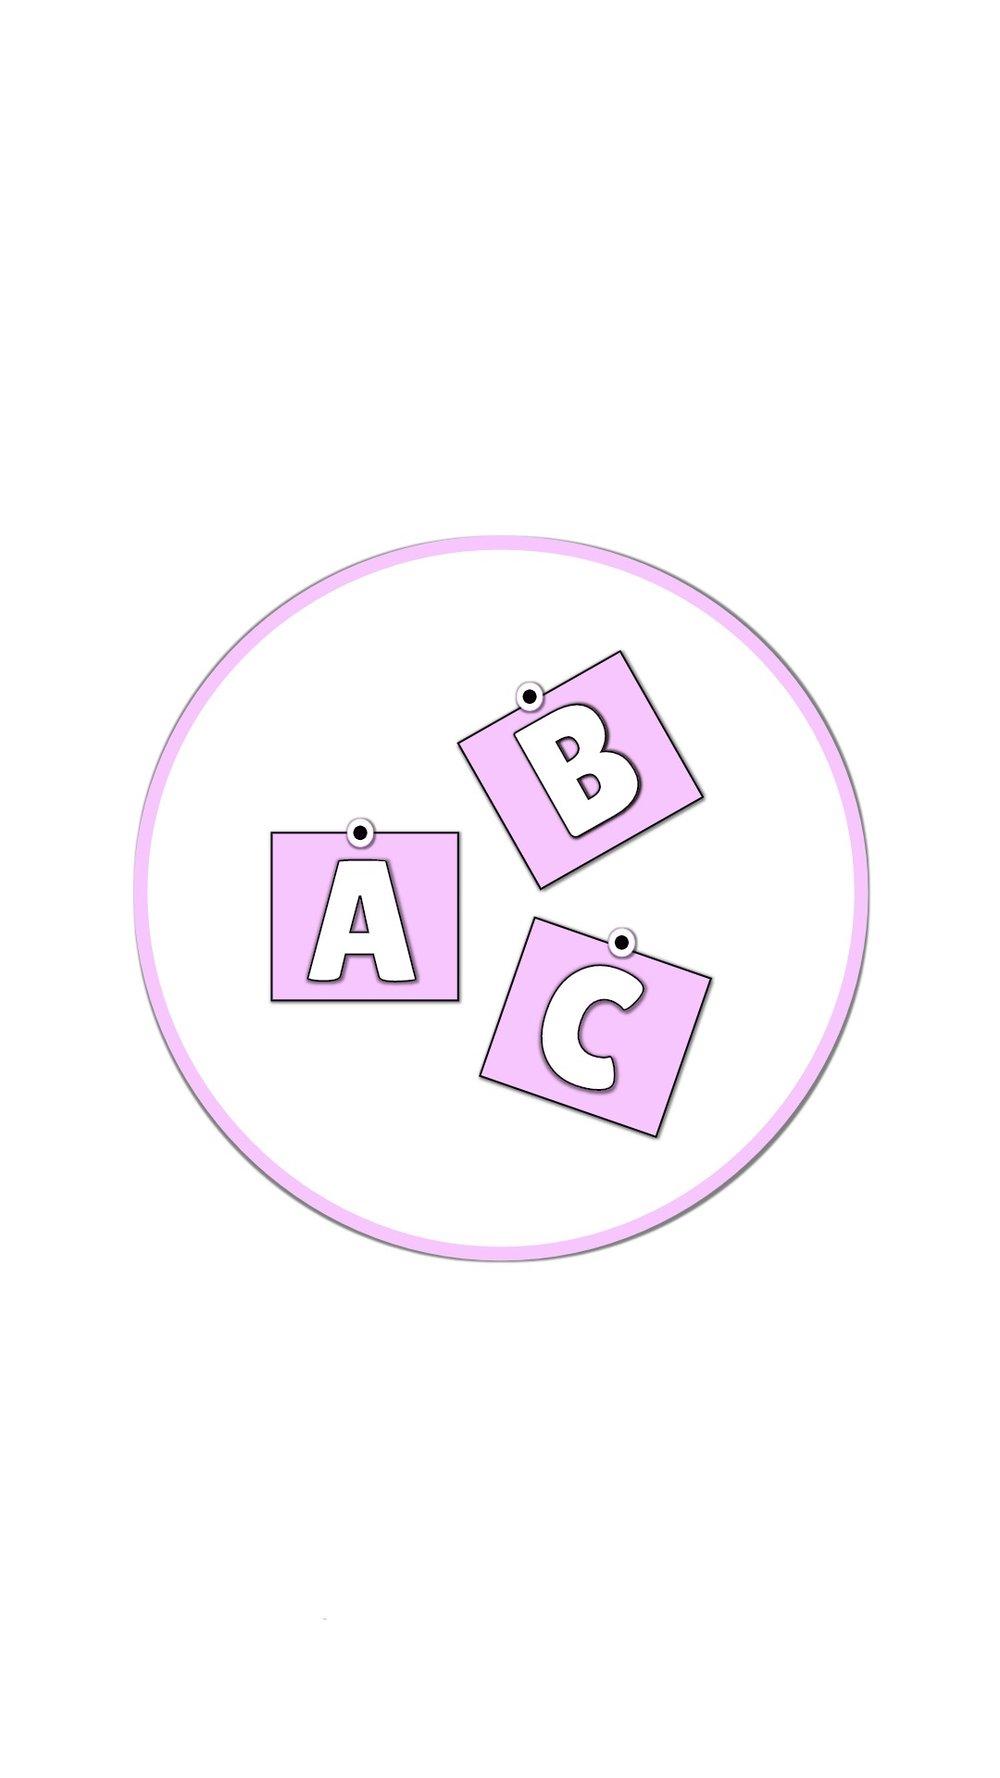 Instagram-cover-baby-ABC-pink-lotnotes.com.jpg